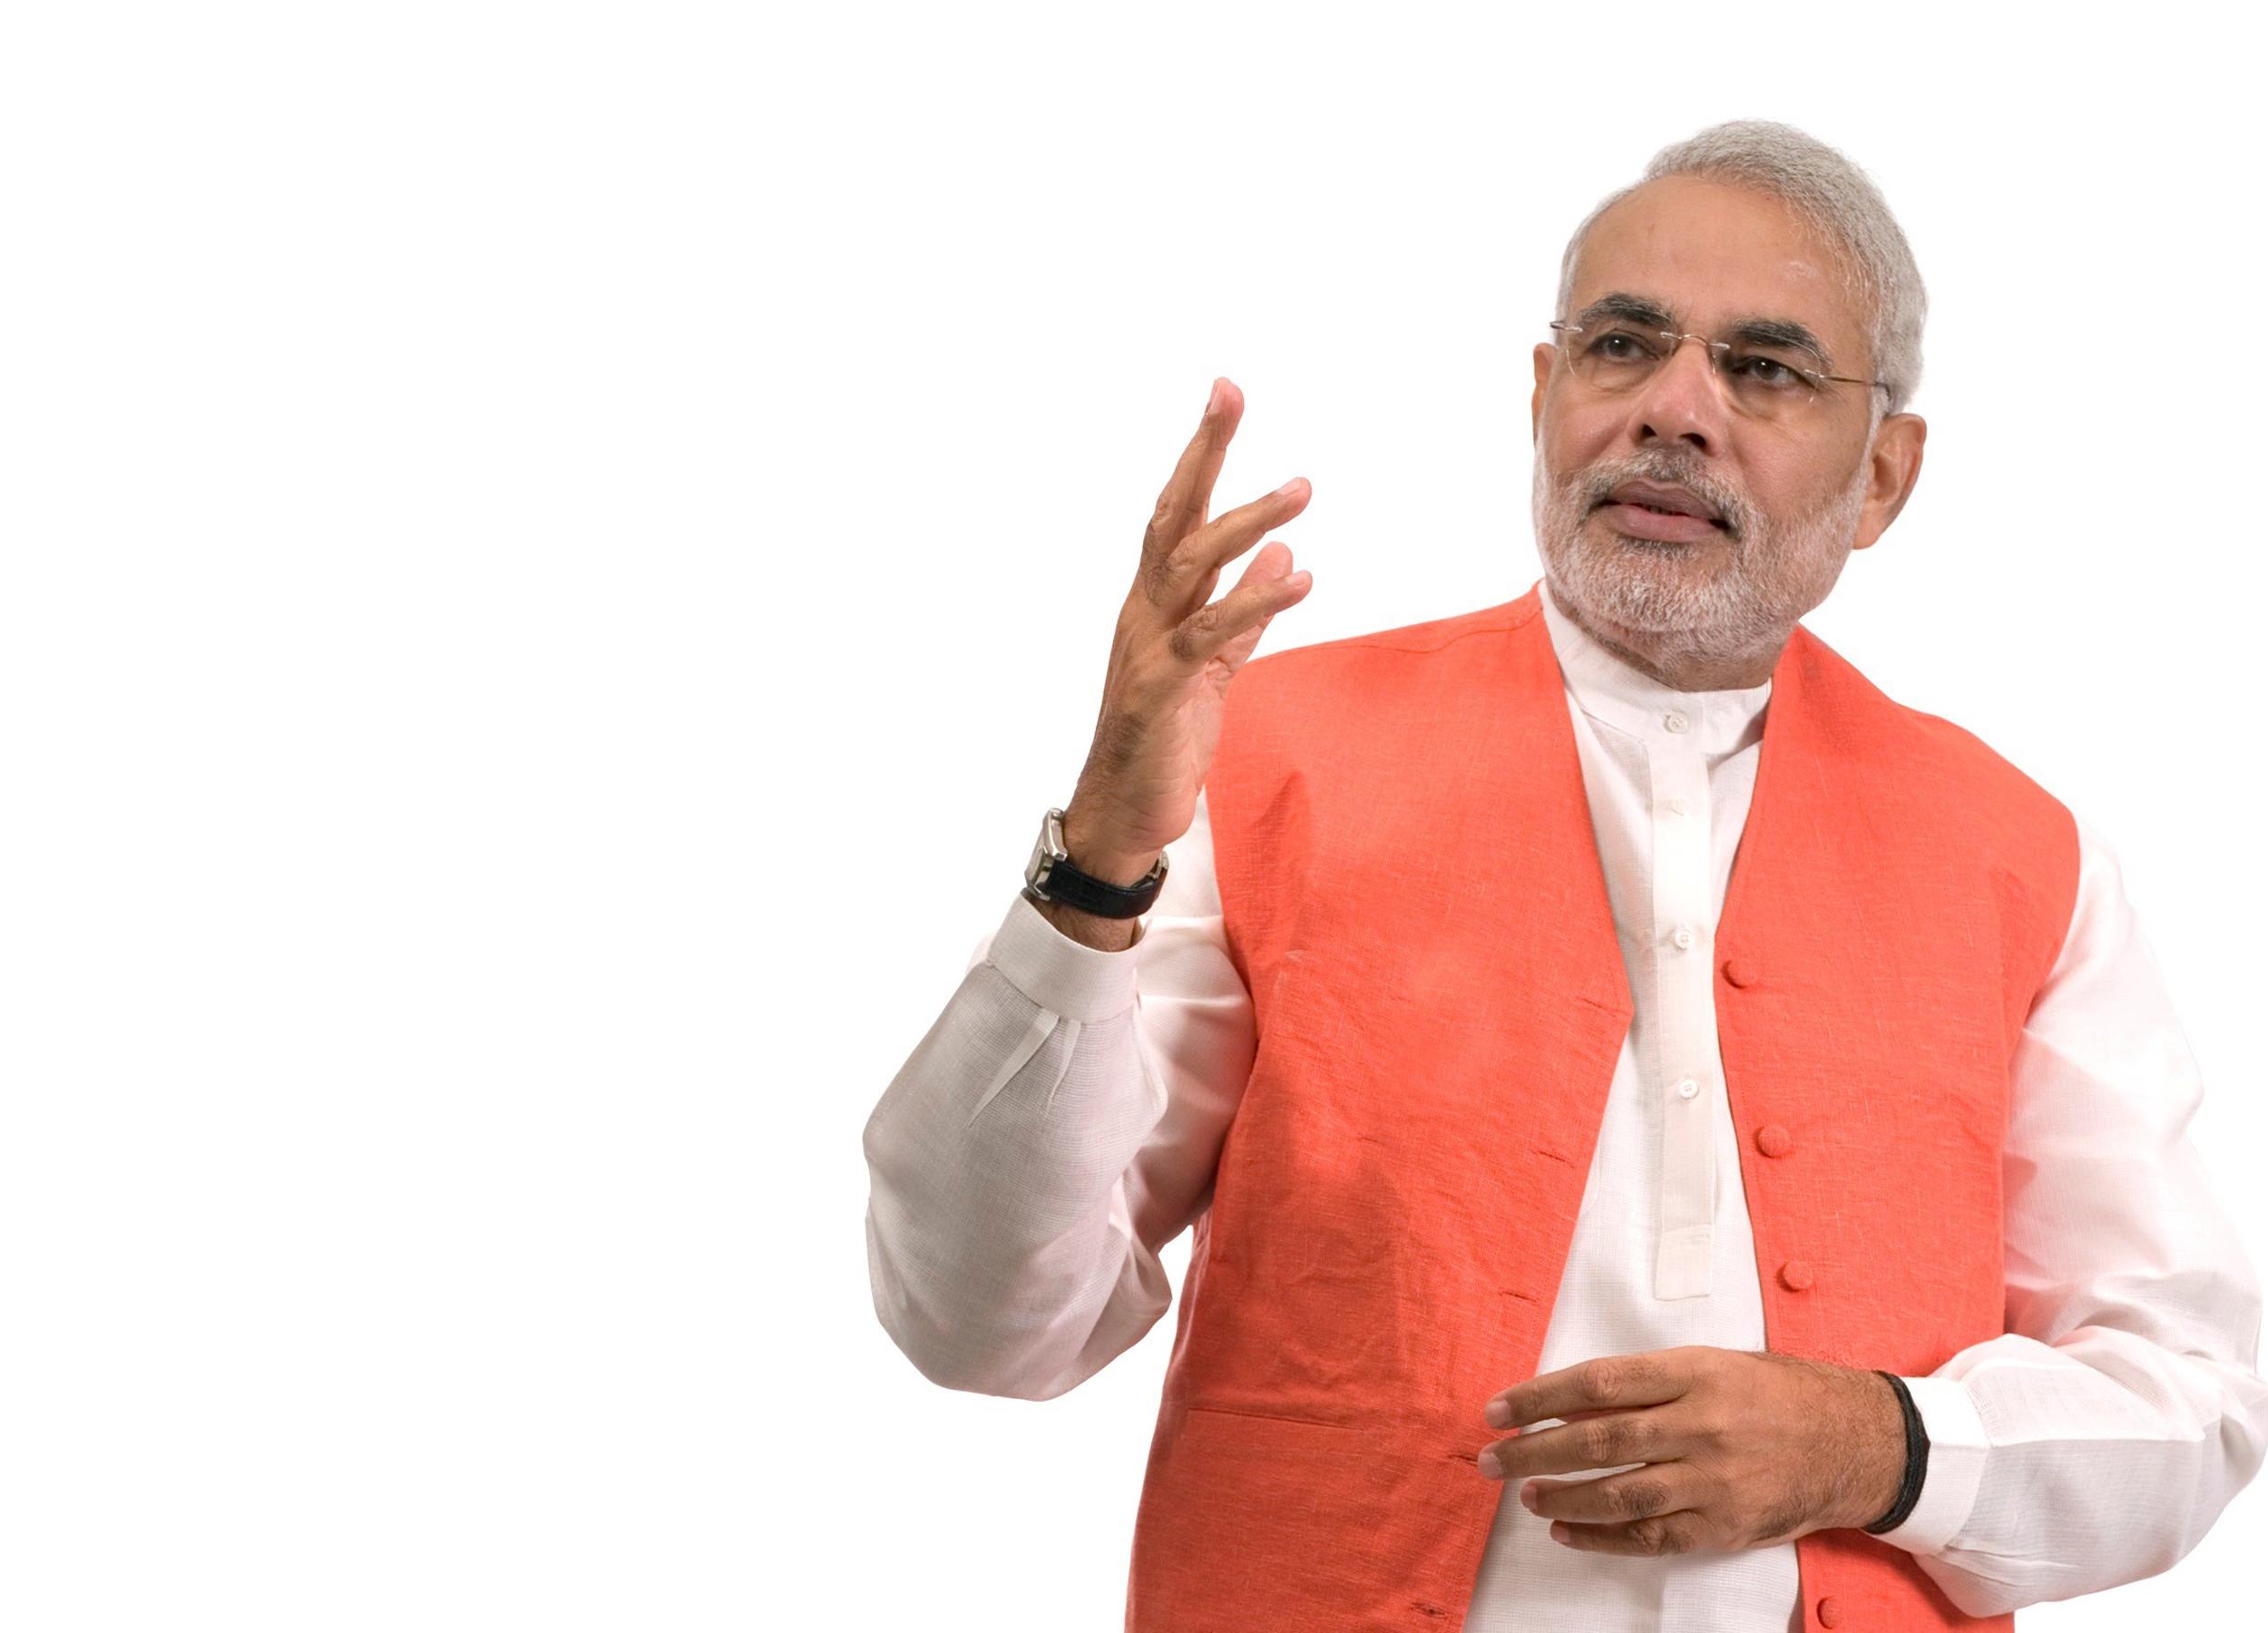 Prime Minister Narendra Modi wished Jonty Rhodesu0027s wwww.desipandora pluspng.com :  Desi Pandora - Narendra Modi PNG